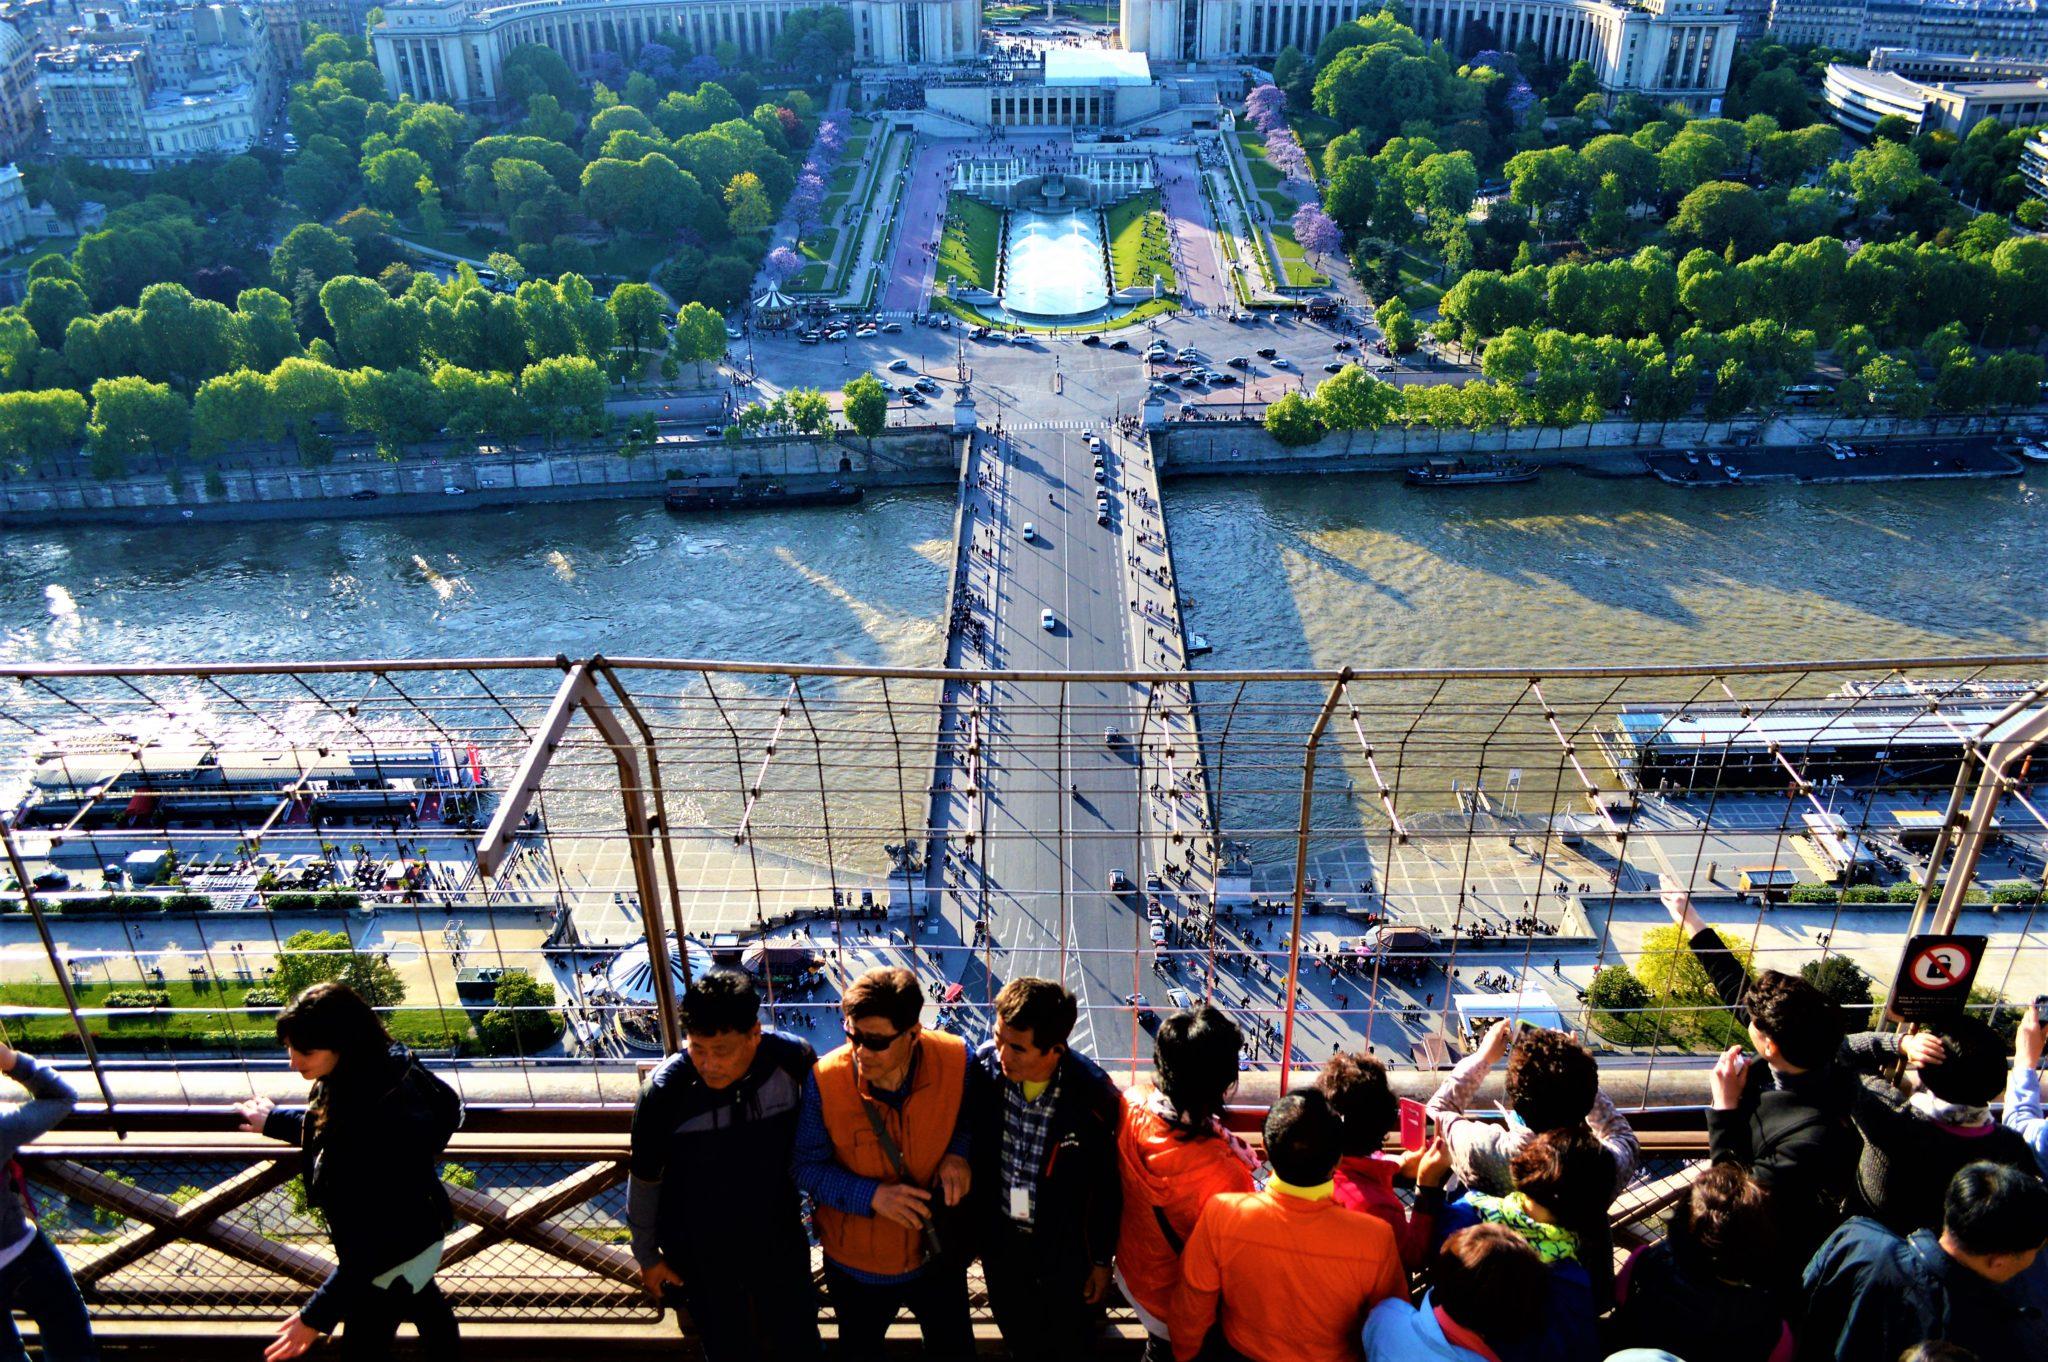 Half way up Eiffel Tower, Paris, France